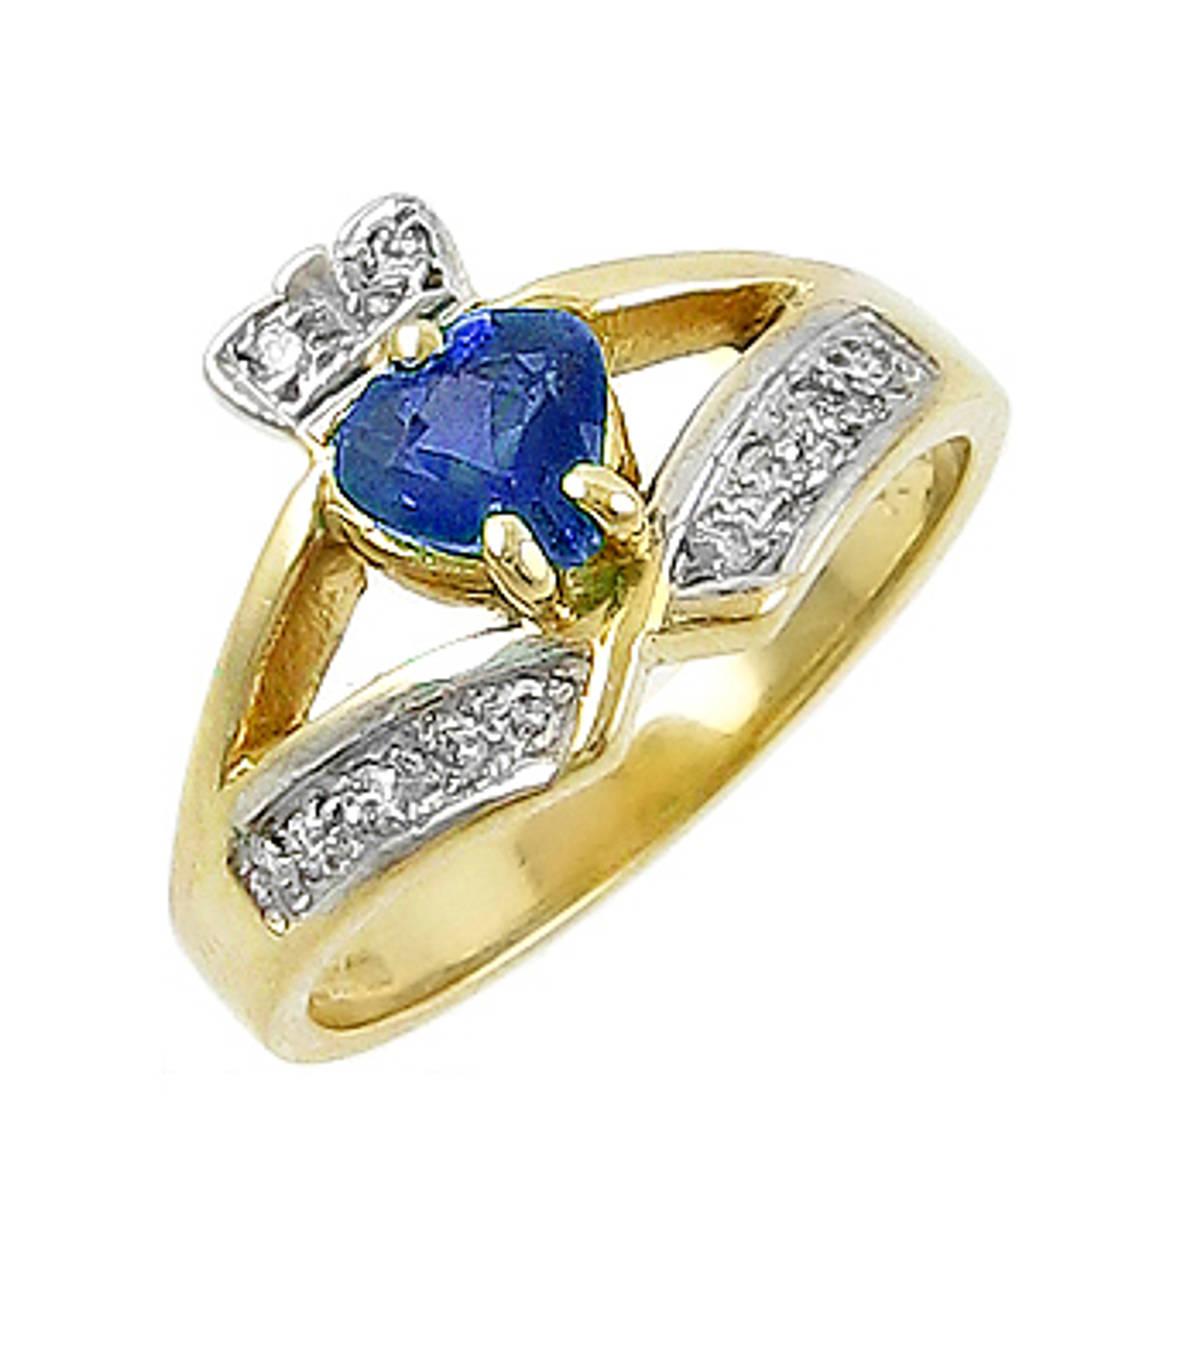 Irish made14 carat yellow gold 0.55cts sapphire/0.12cts diamonds claddagh engagement ring